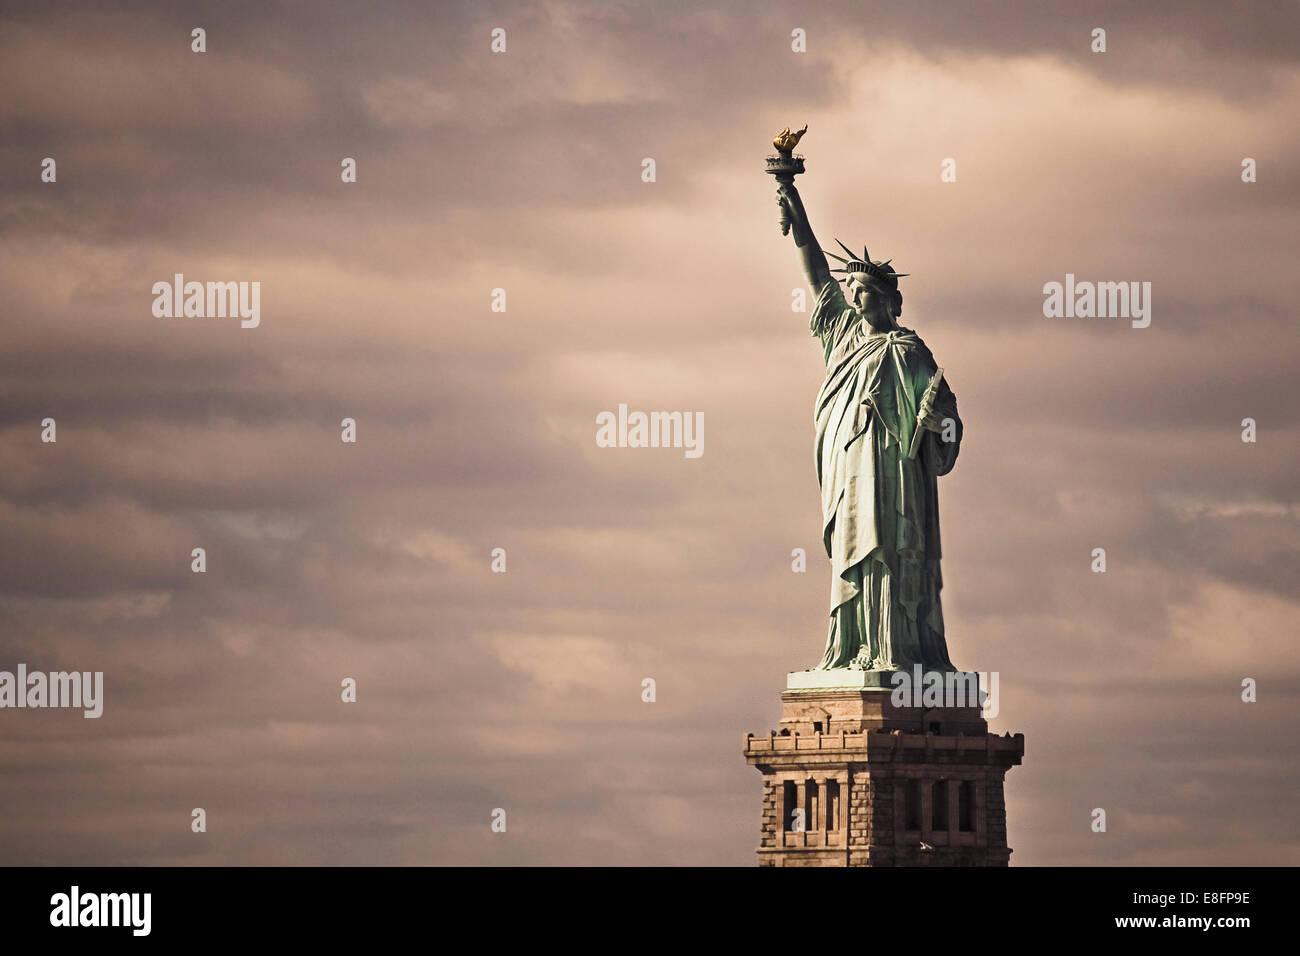 USA, New York State, New York City, Statue Of Liberty Stockbild